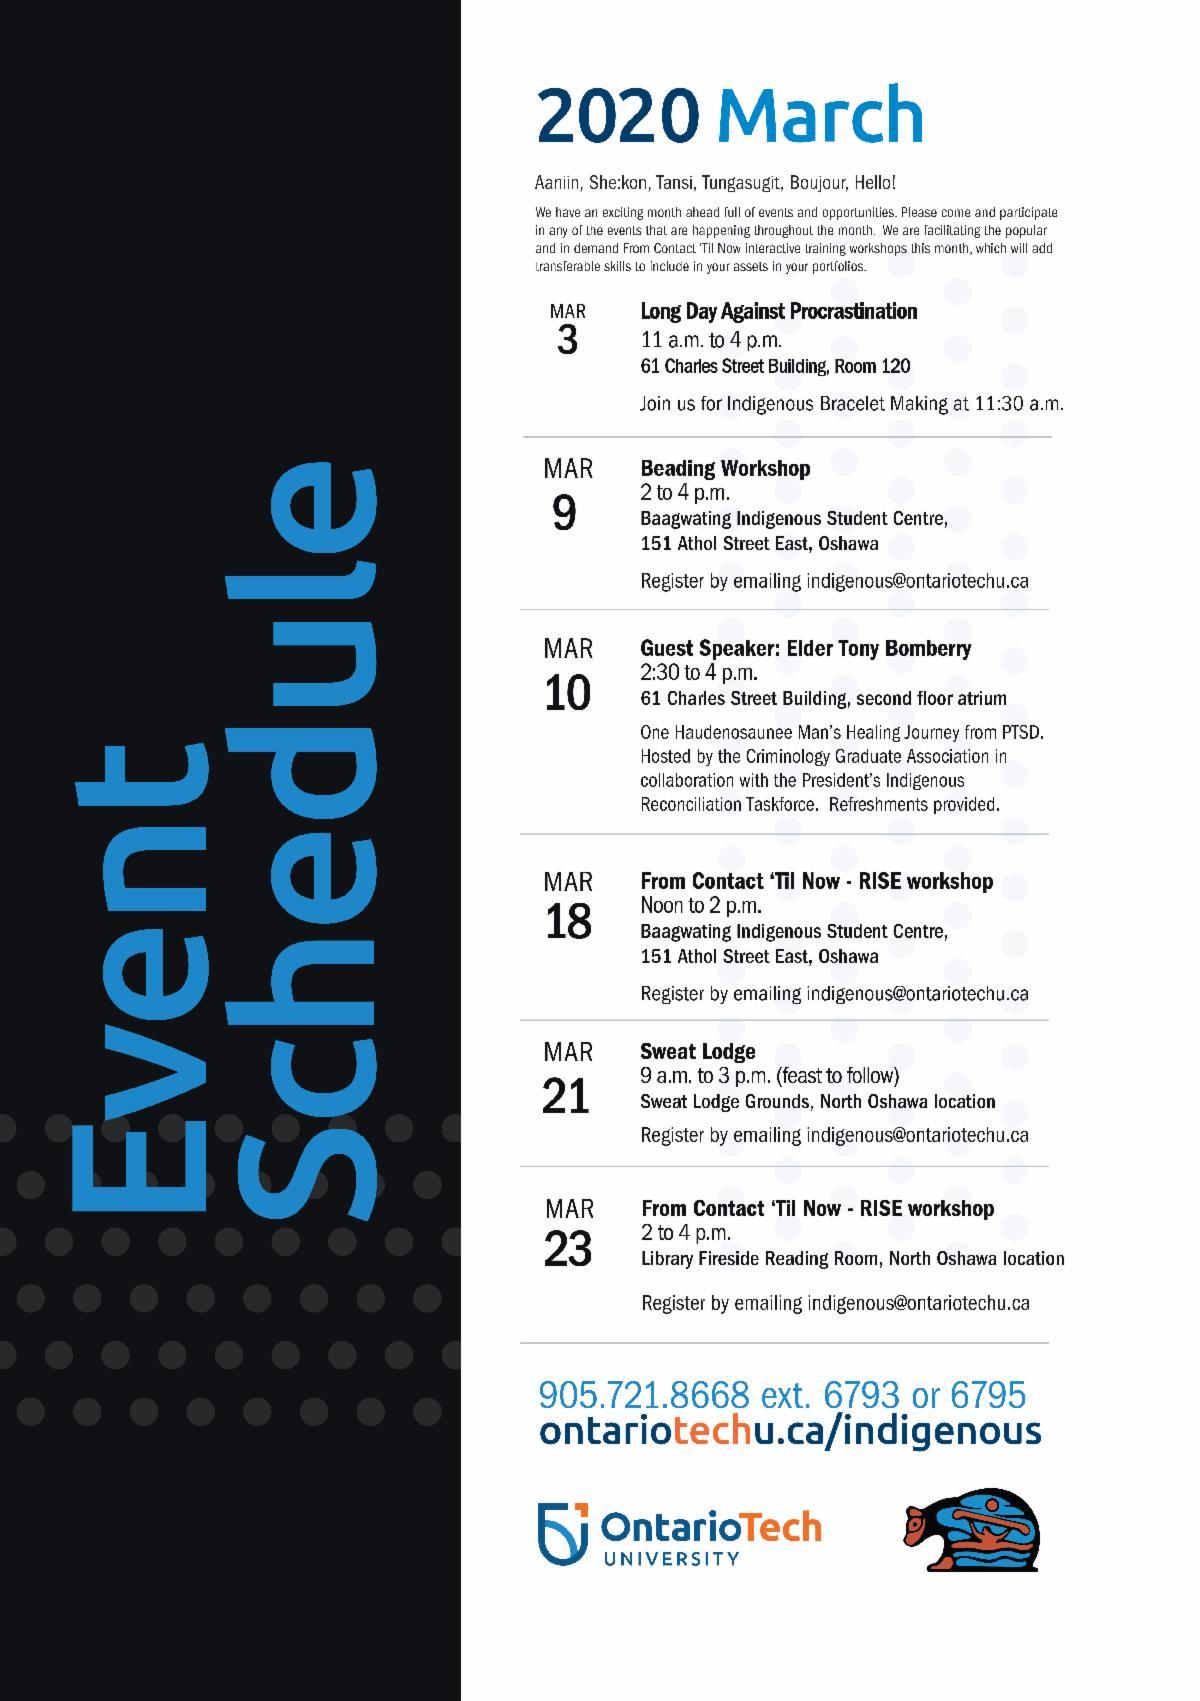 Indigenous event schedule for Ontario Tech University